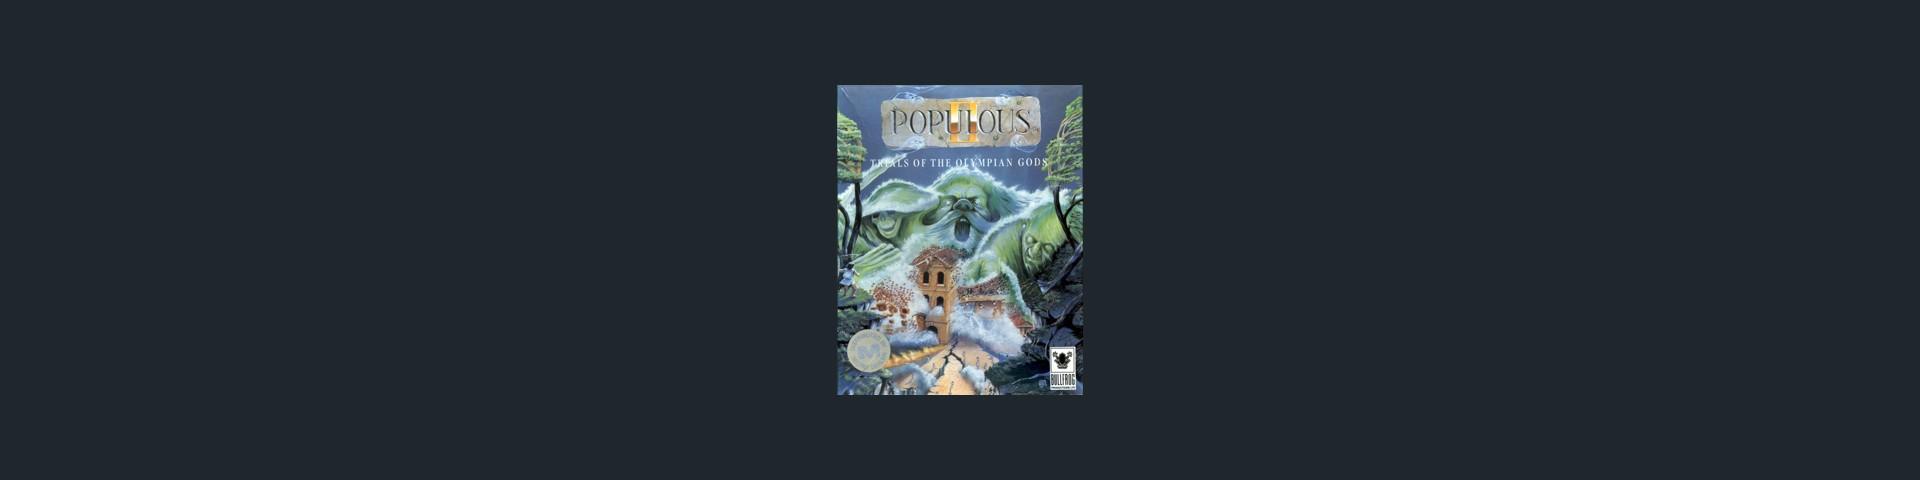 Populous™ II: Trials of the Olympian Gods